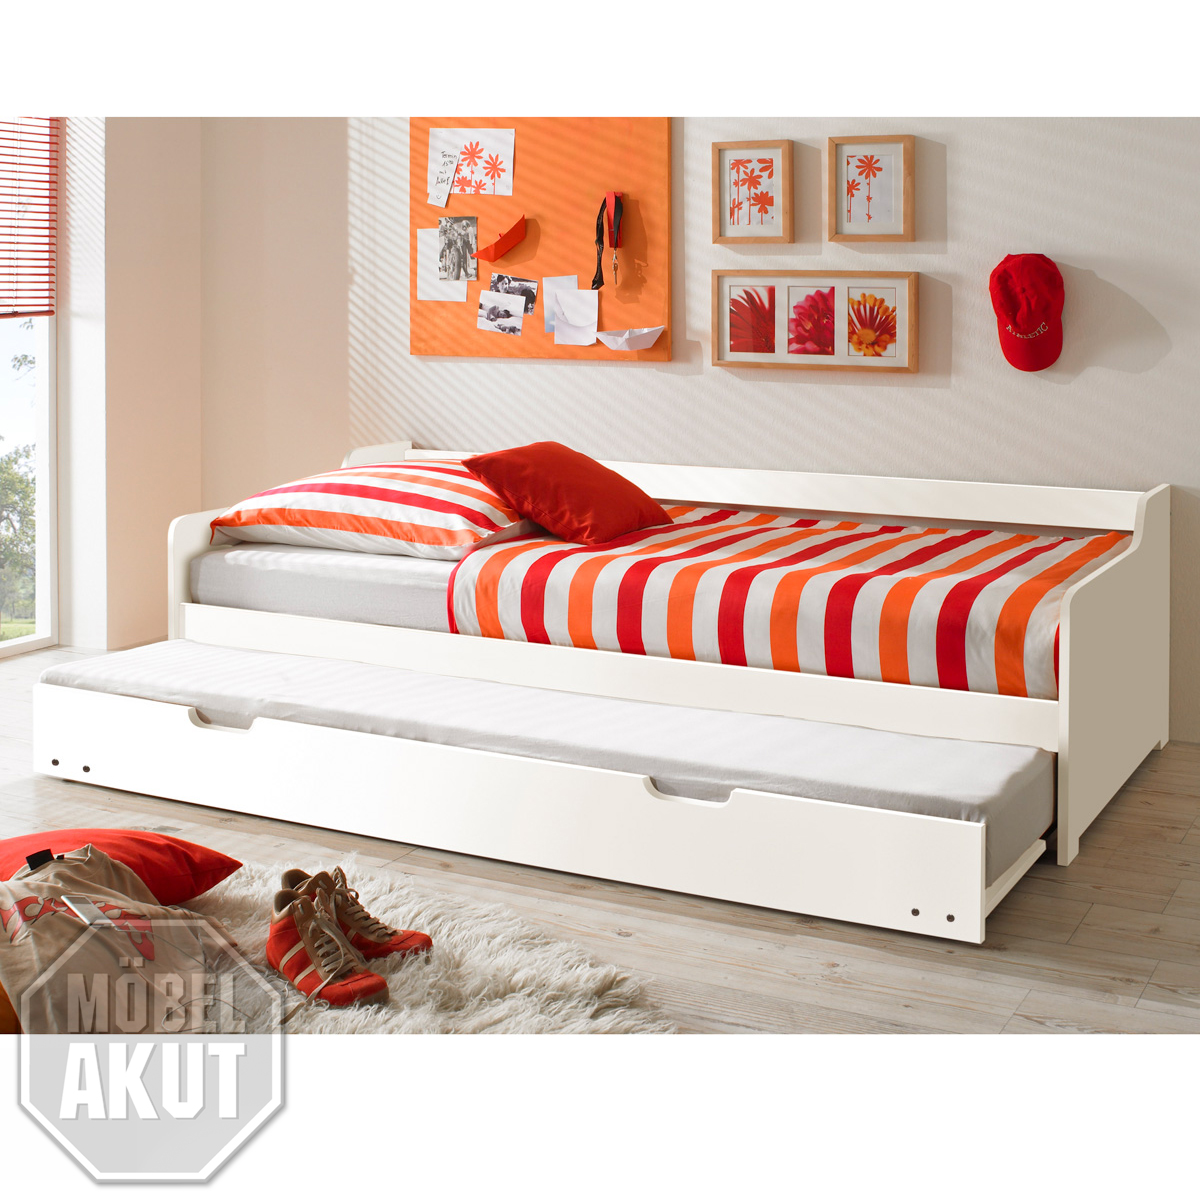 tandemliege bonno bett in kiefer massiv wei 90x200 ebay. Black Bedroom Furniture Sets. Home Design Ideas